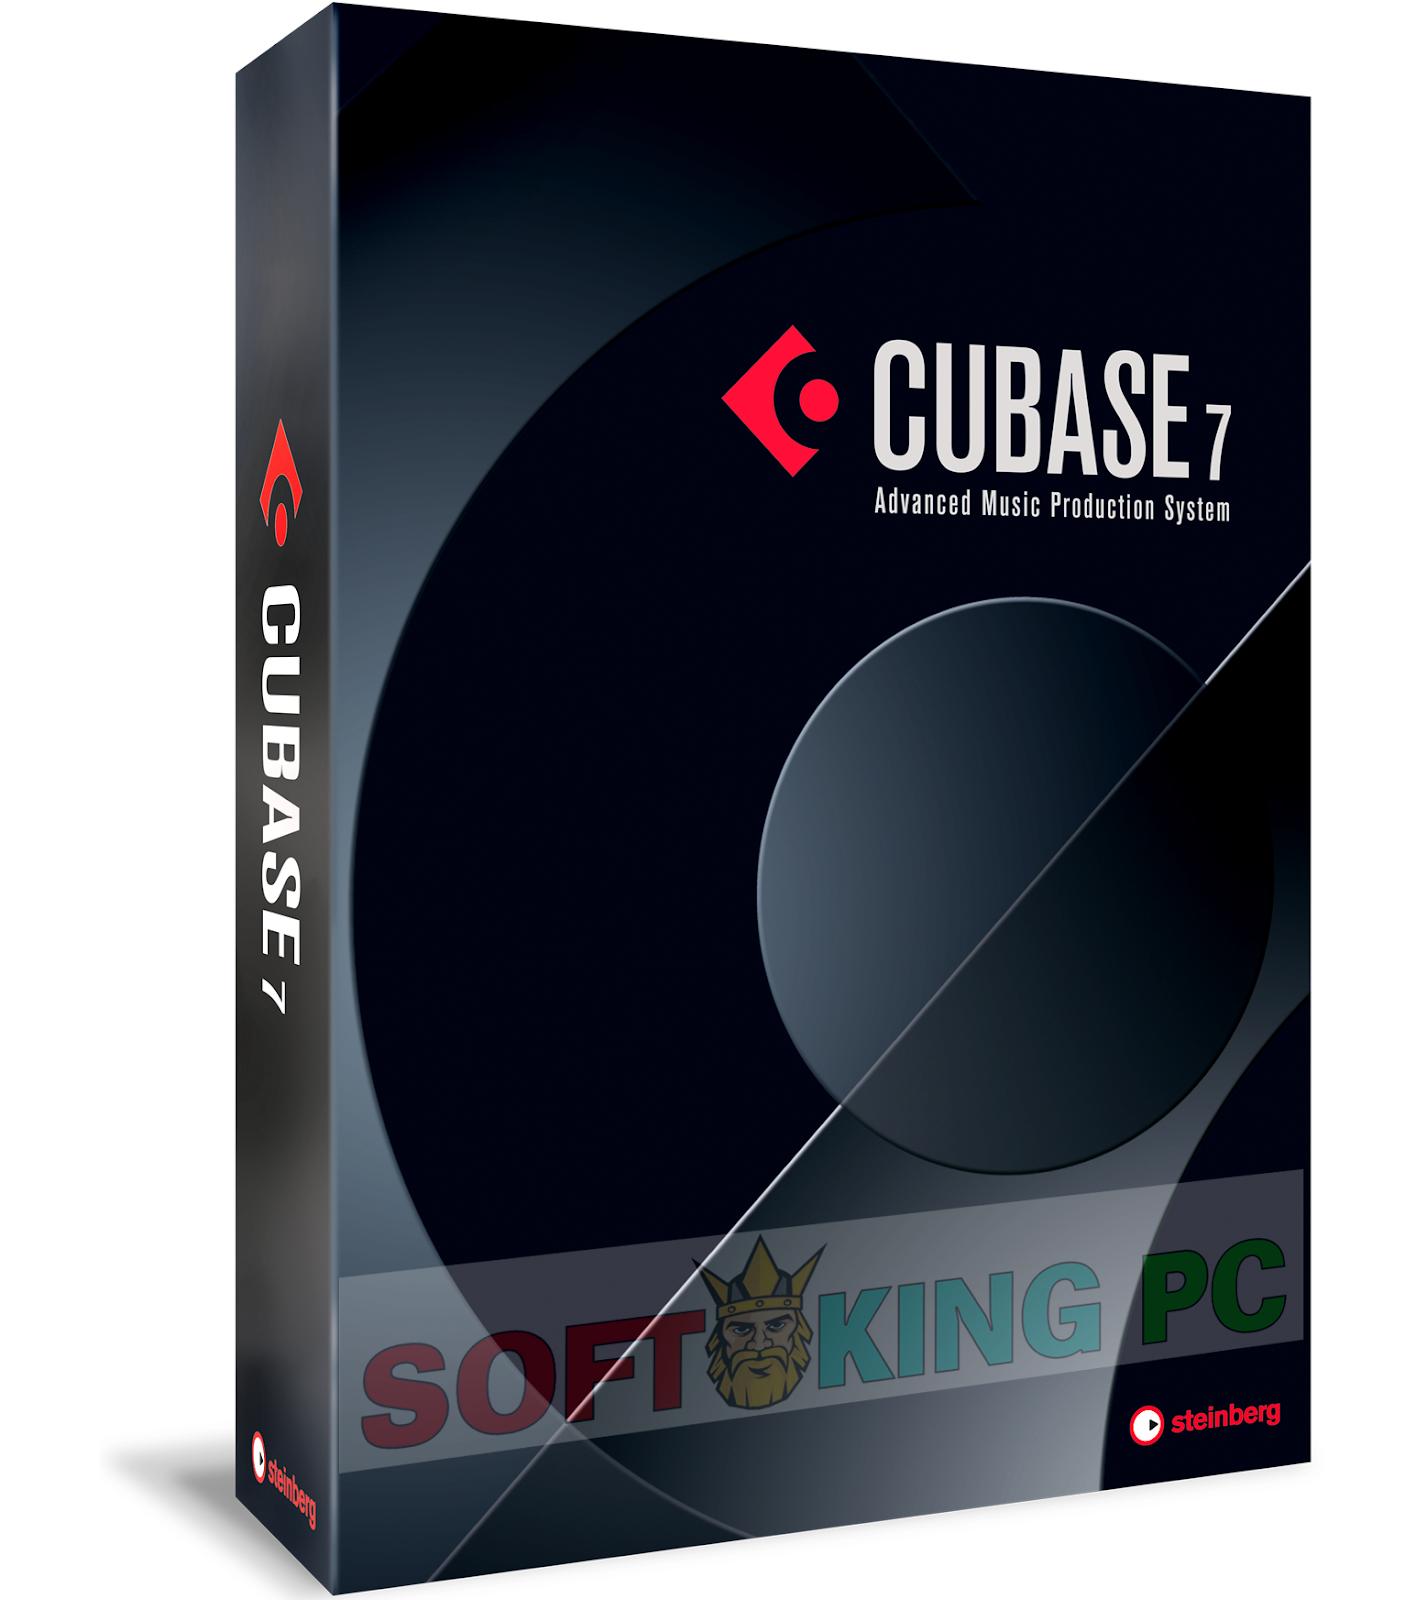 Cubase 7 Latest Version Free Download Cubase Music Software Free Download